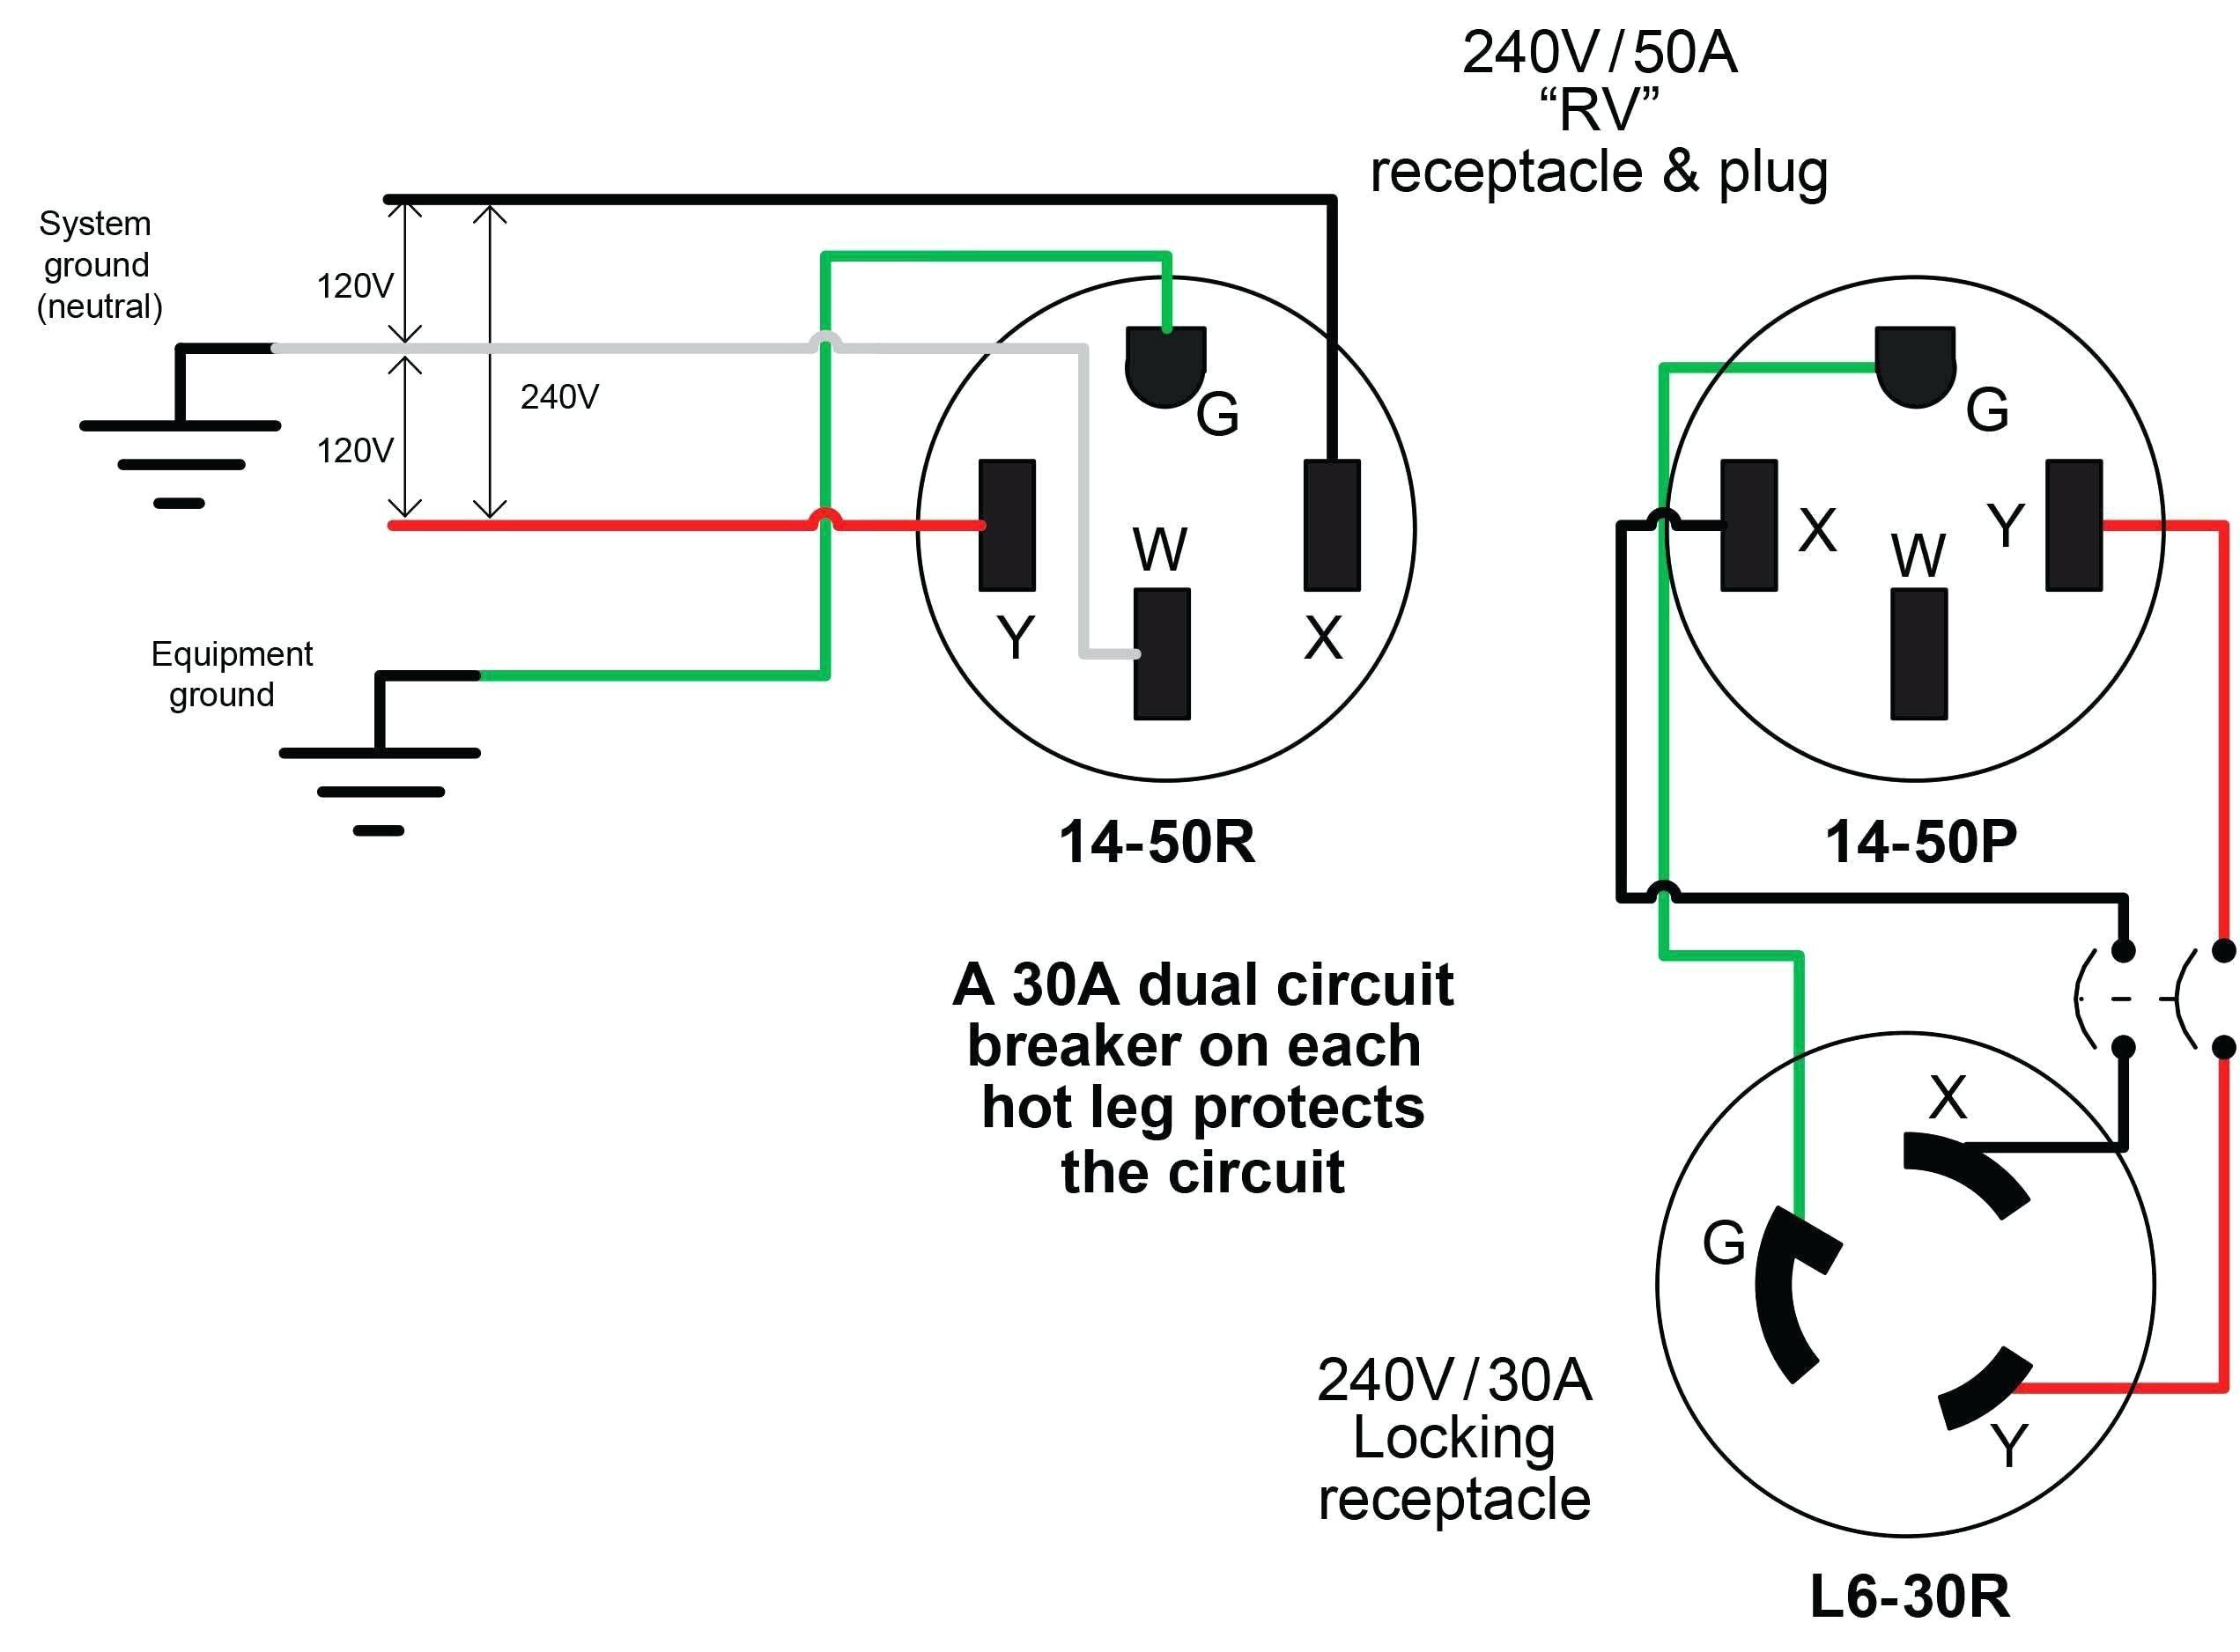 110v Ac Plug Wiring Diagram Wiring Diagram for 220 Volt Generator Plug Outlet Wiring